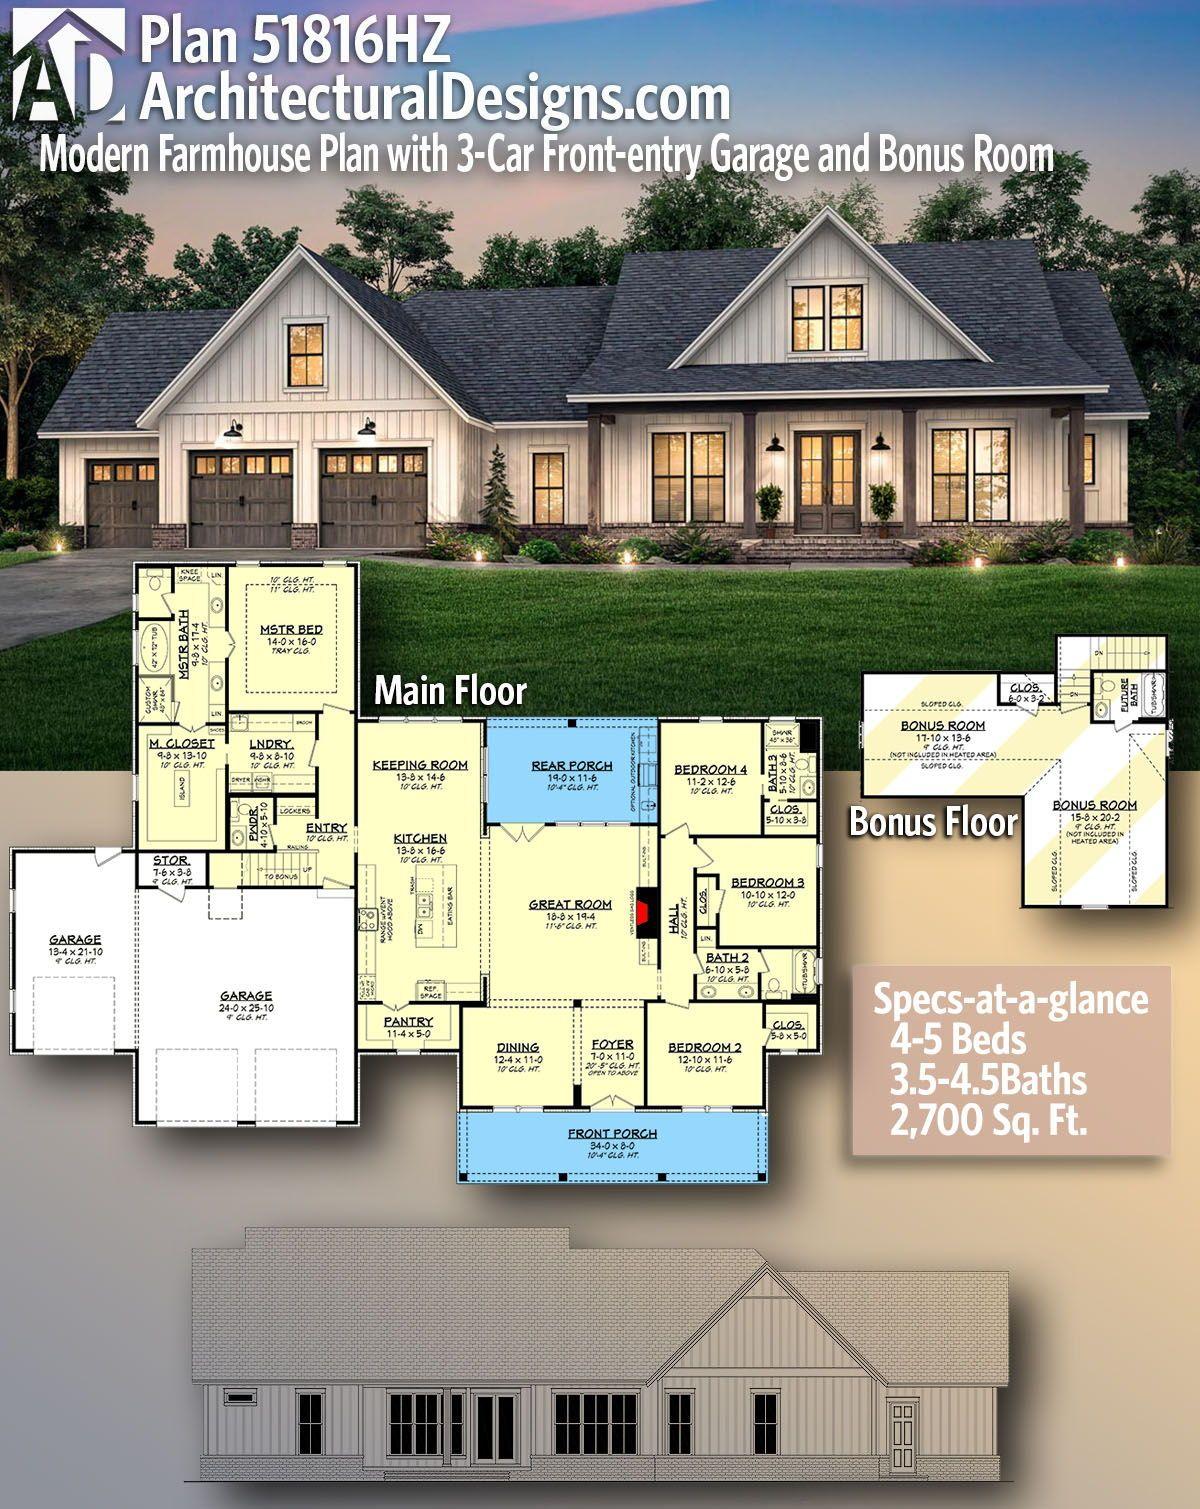 Plan 51816hz Modern Farmhouse Plan With 3 Car Front Entry Garage And Bonus Room Modern Farmhouse Plans House Plans Farmhouse New House Plans